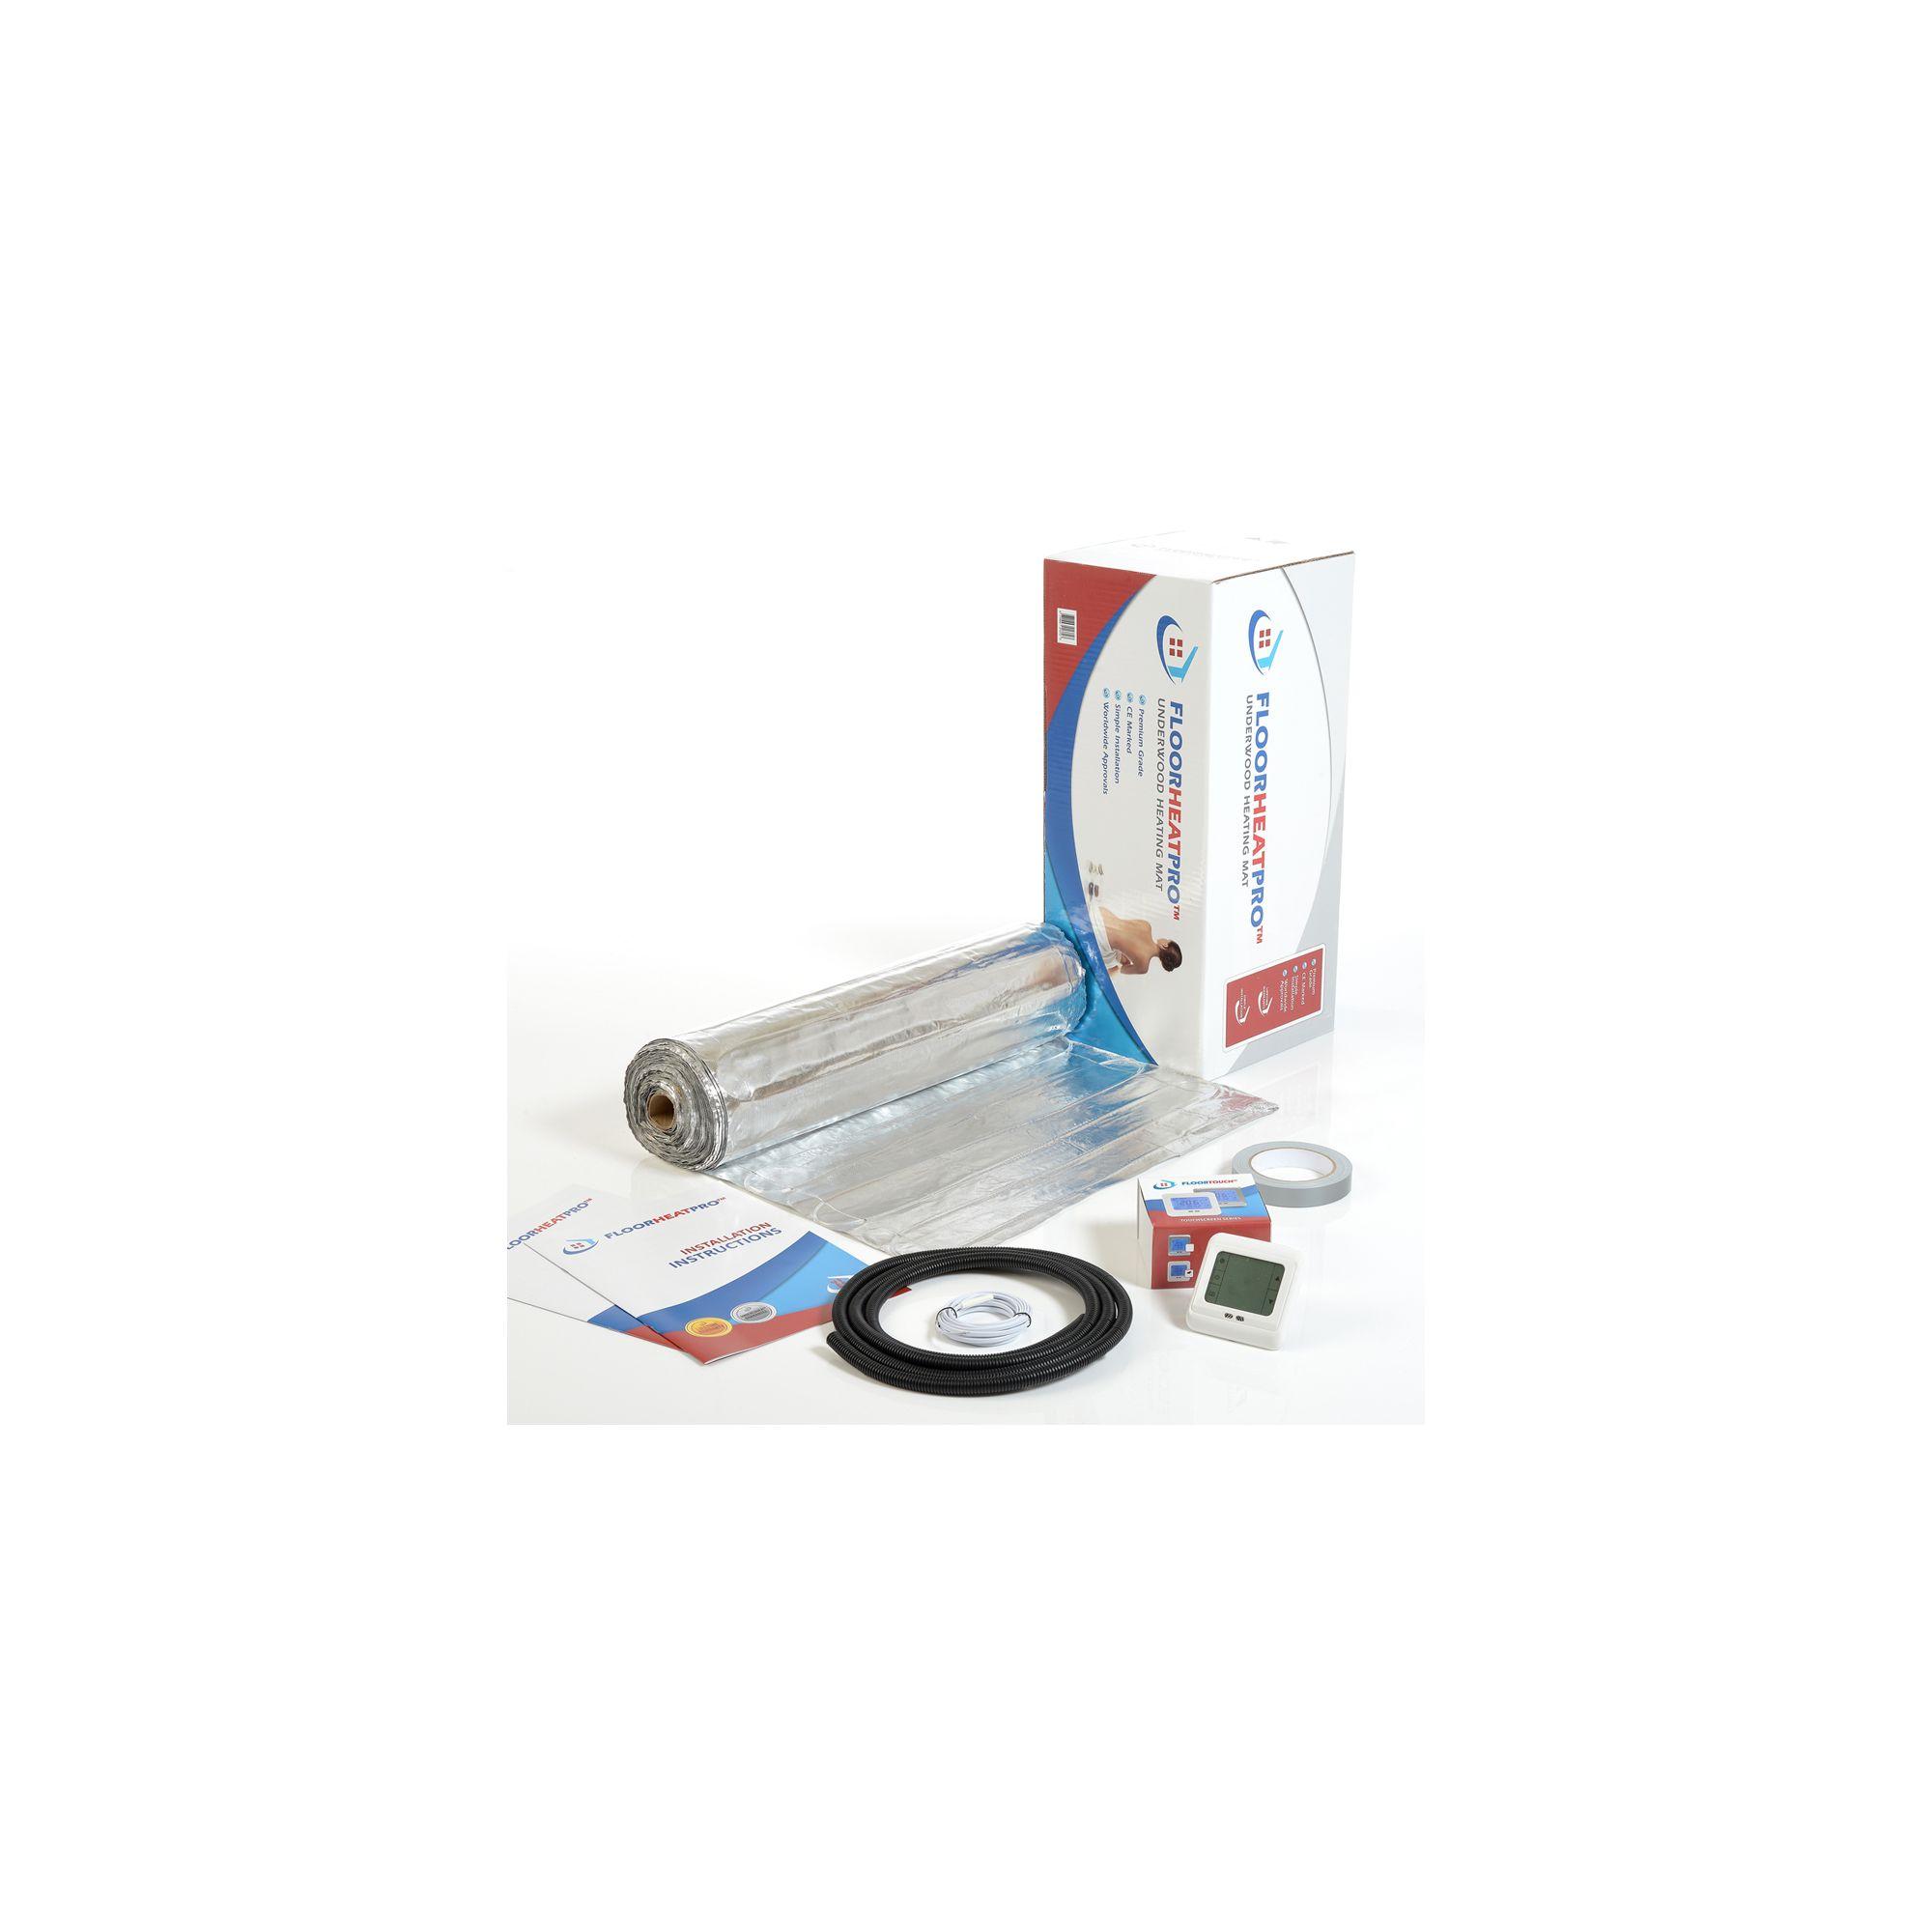 23.0 m2 - Underfloor Electric Heating Kit - Laminate at Tesco Direct